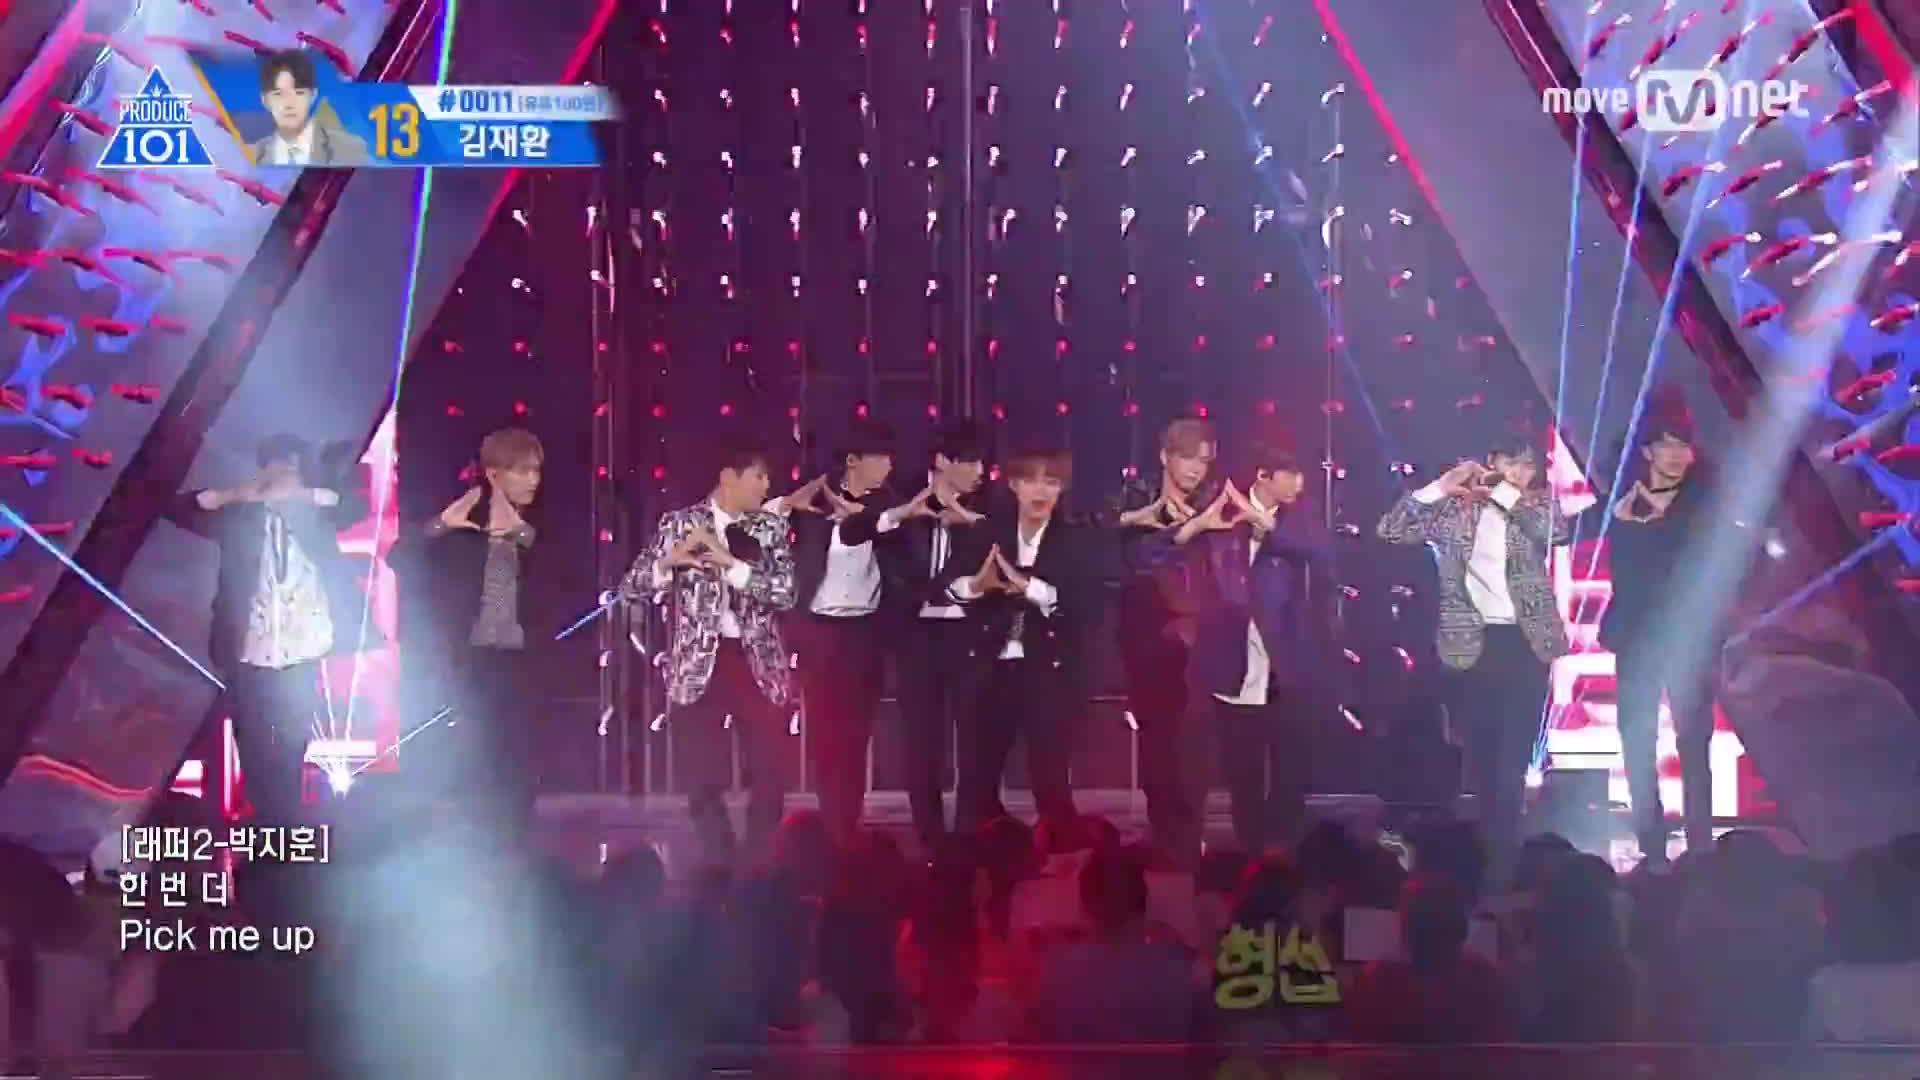 produce101, 프로듀스101, 프로듀스101시즌2, PRODUCE 101 season2 [최종희] Hands on Me Final 데뷔 평가 무대 170616 EP.11 GIFs